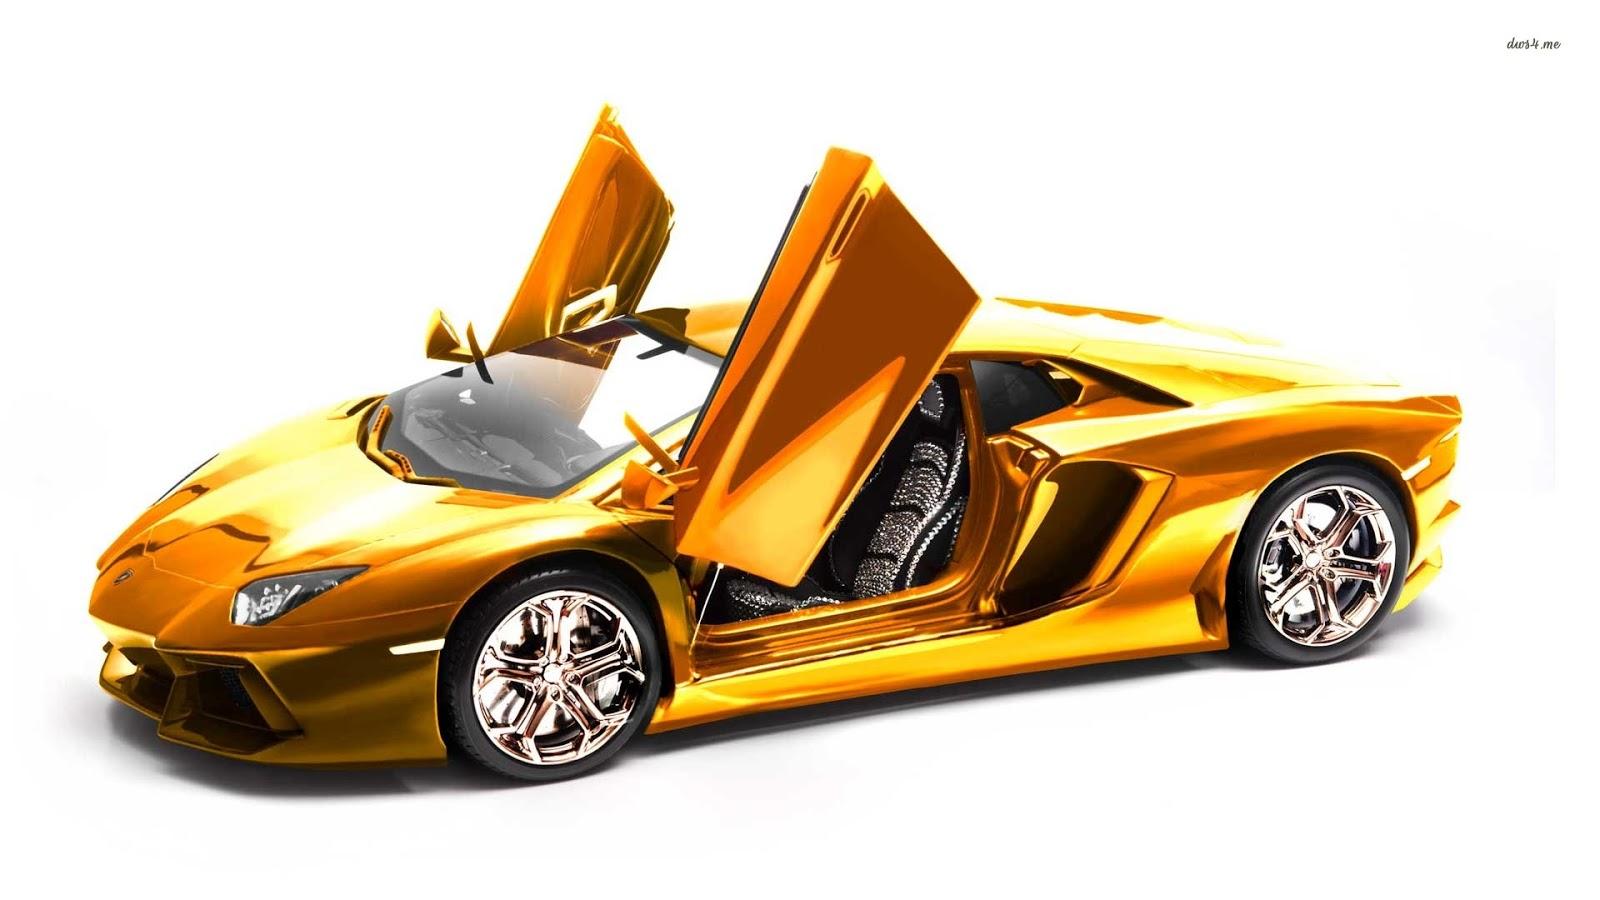 New Lamborghini Aventador Car Wallpaper